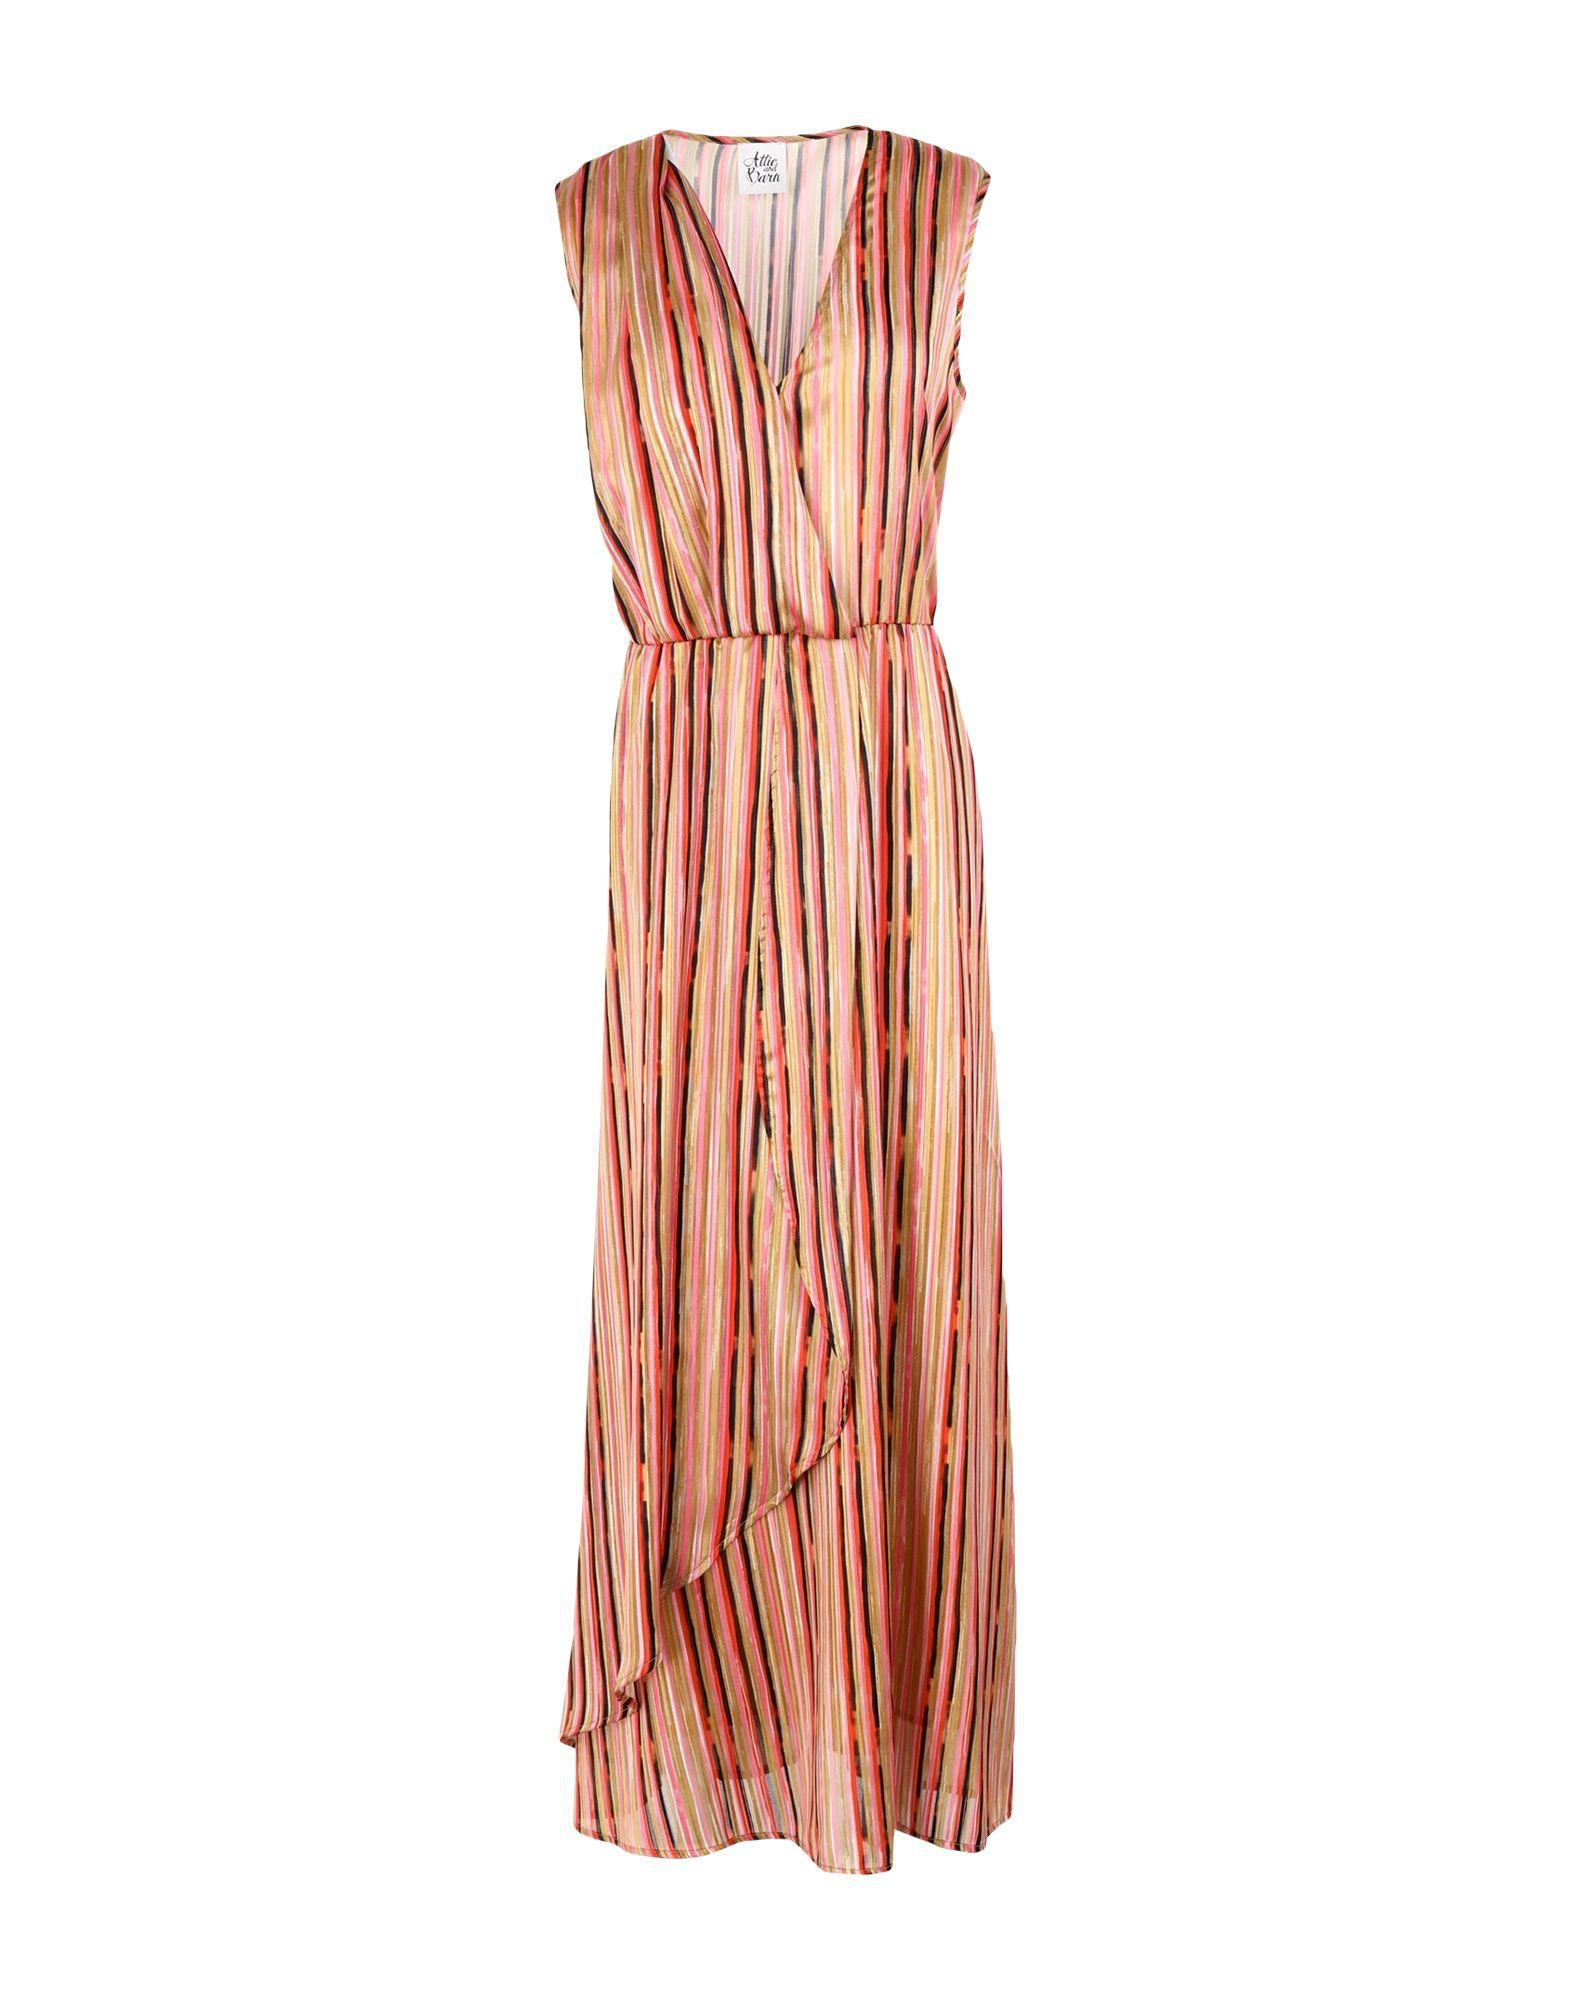 ATTIC AND BARN Платье длиной 3/4